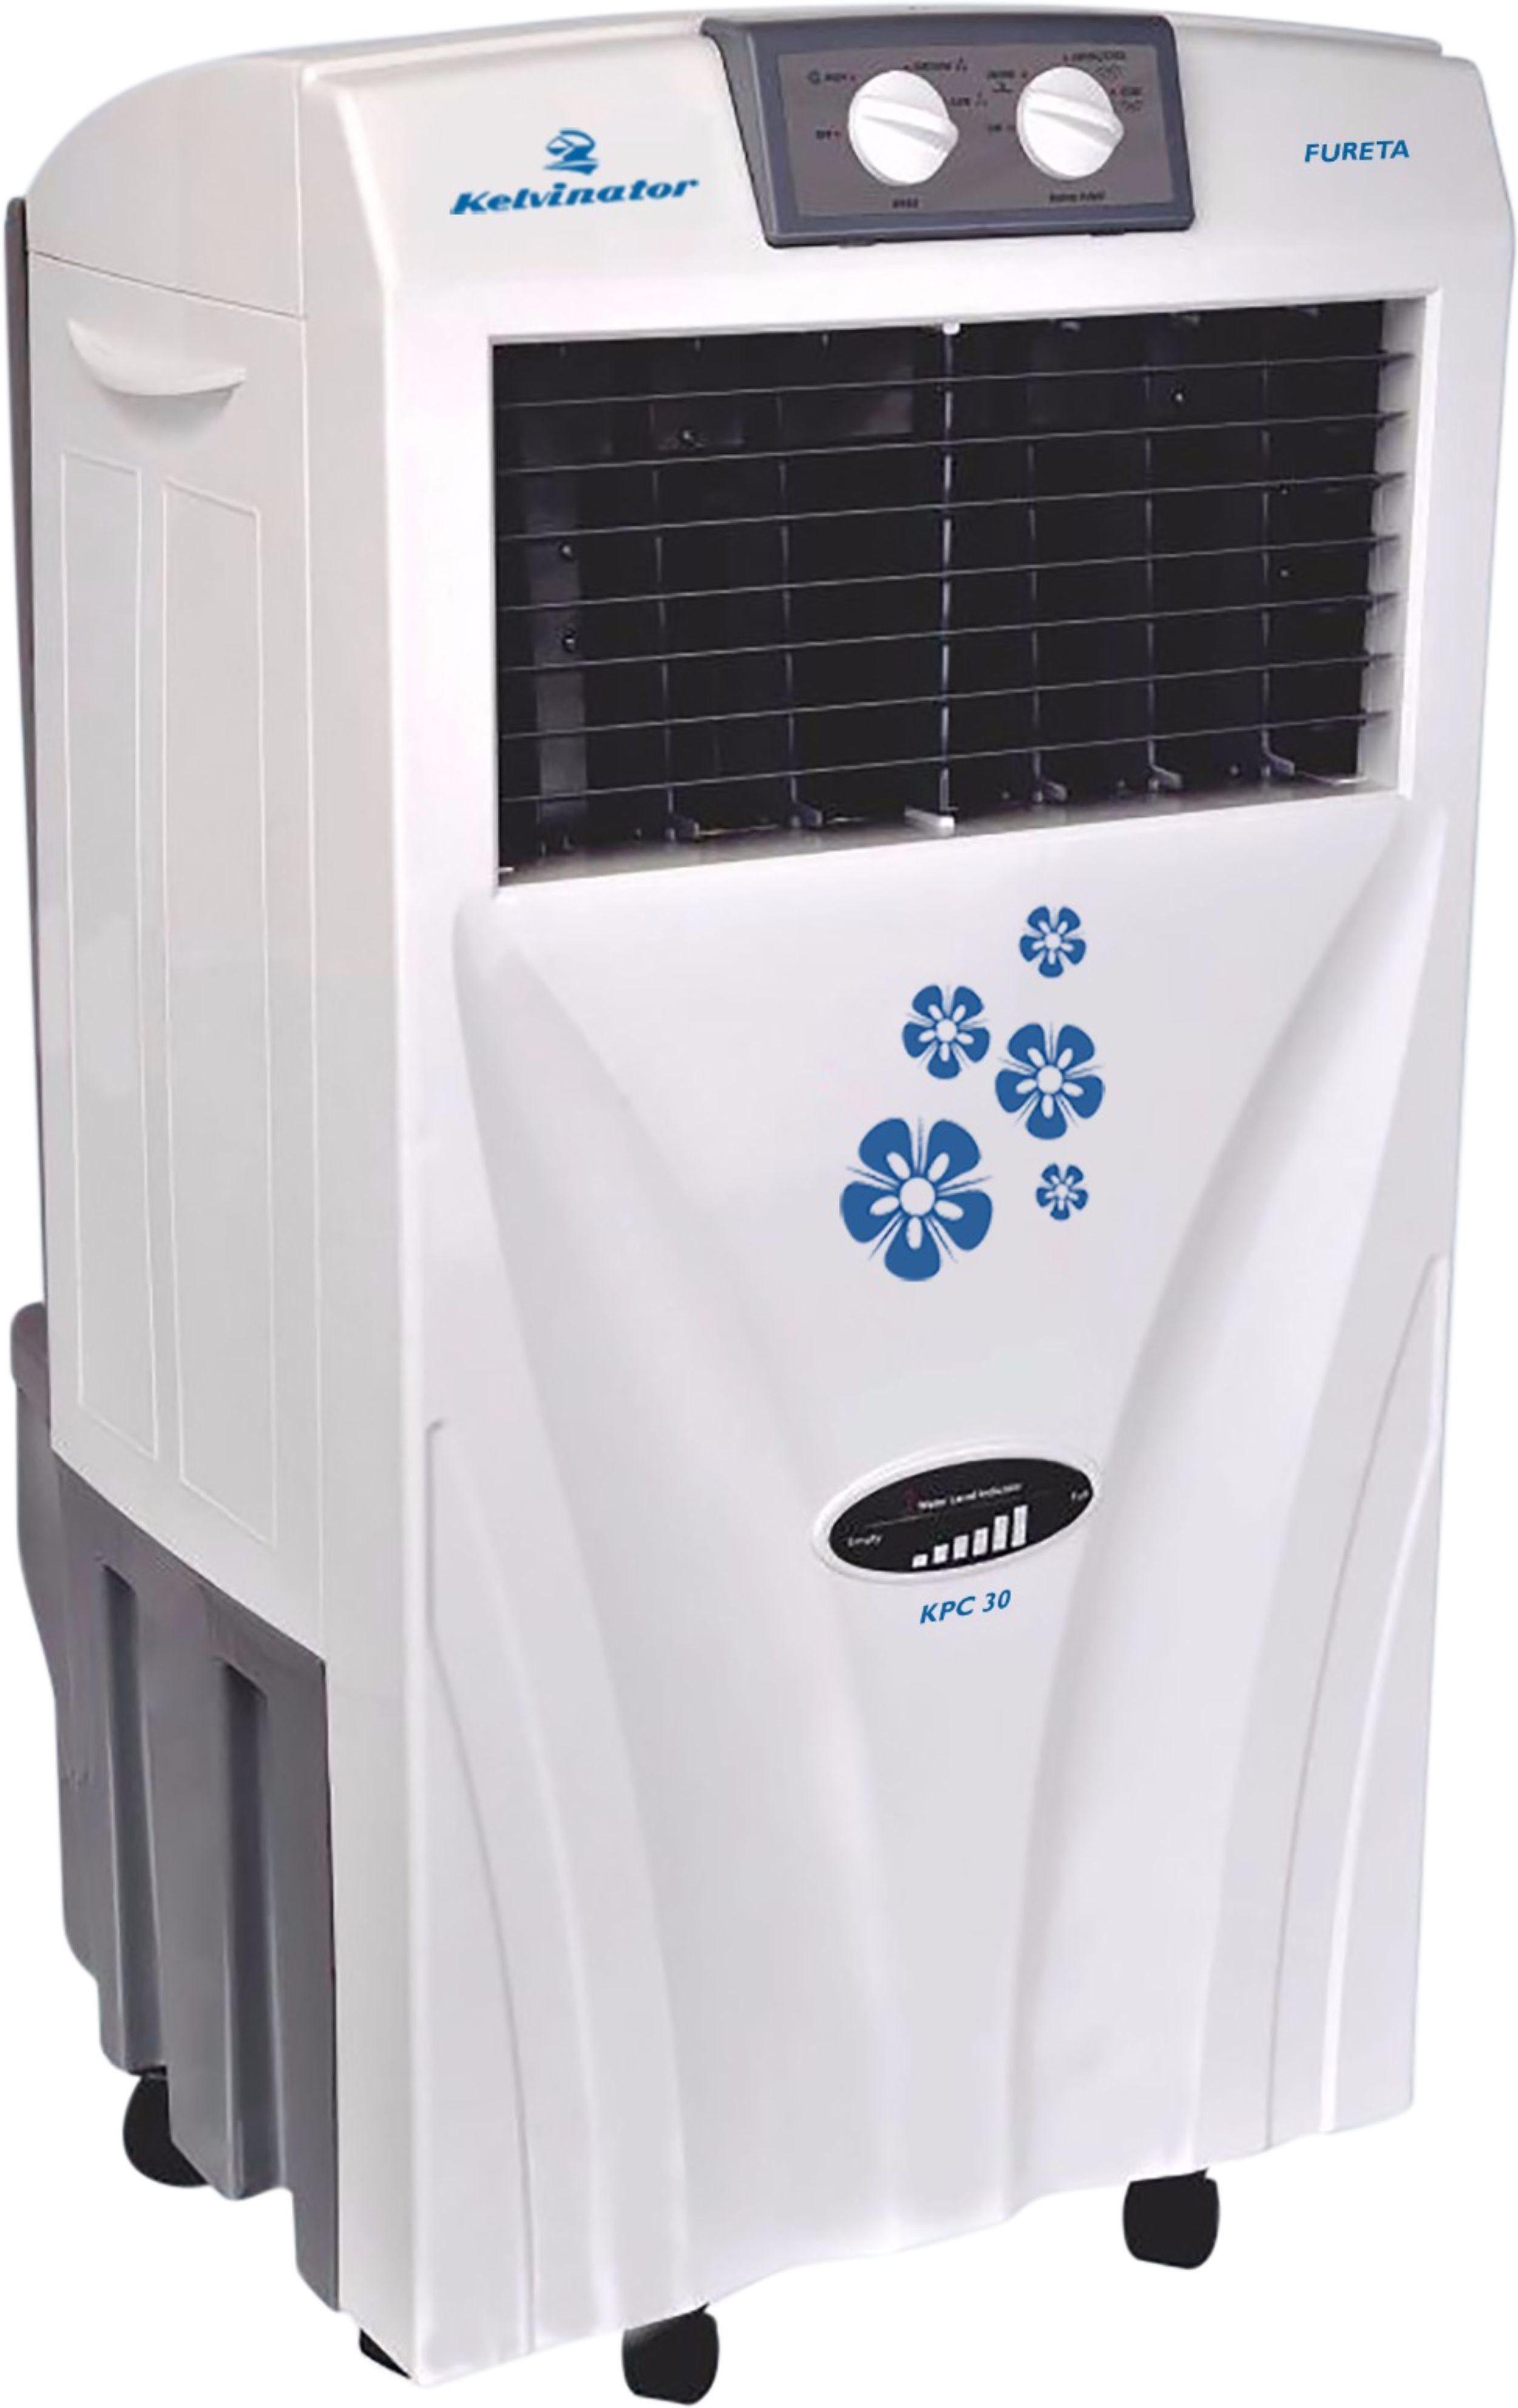 Singer liberty jumbo dx desert cooler online at best price in india - View Kelvinator Fureta Personal Air Cooler White 30 Litres Price Online